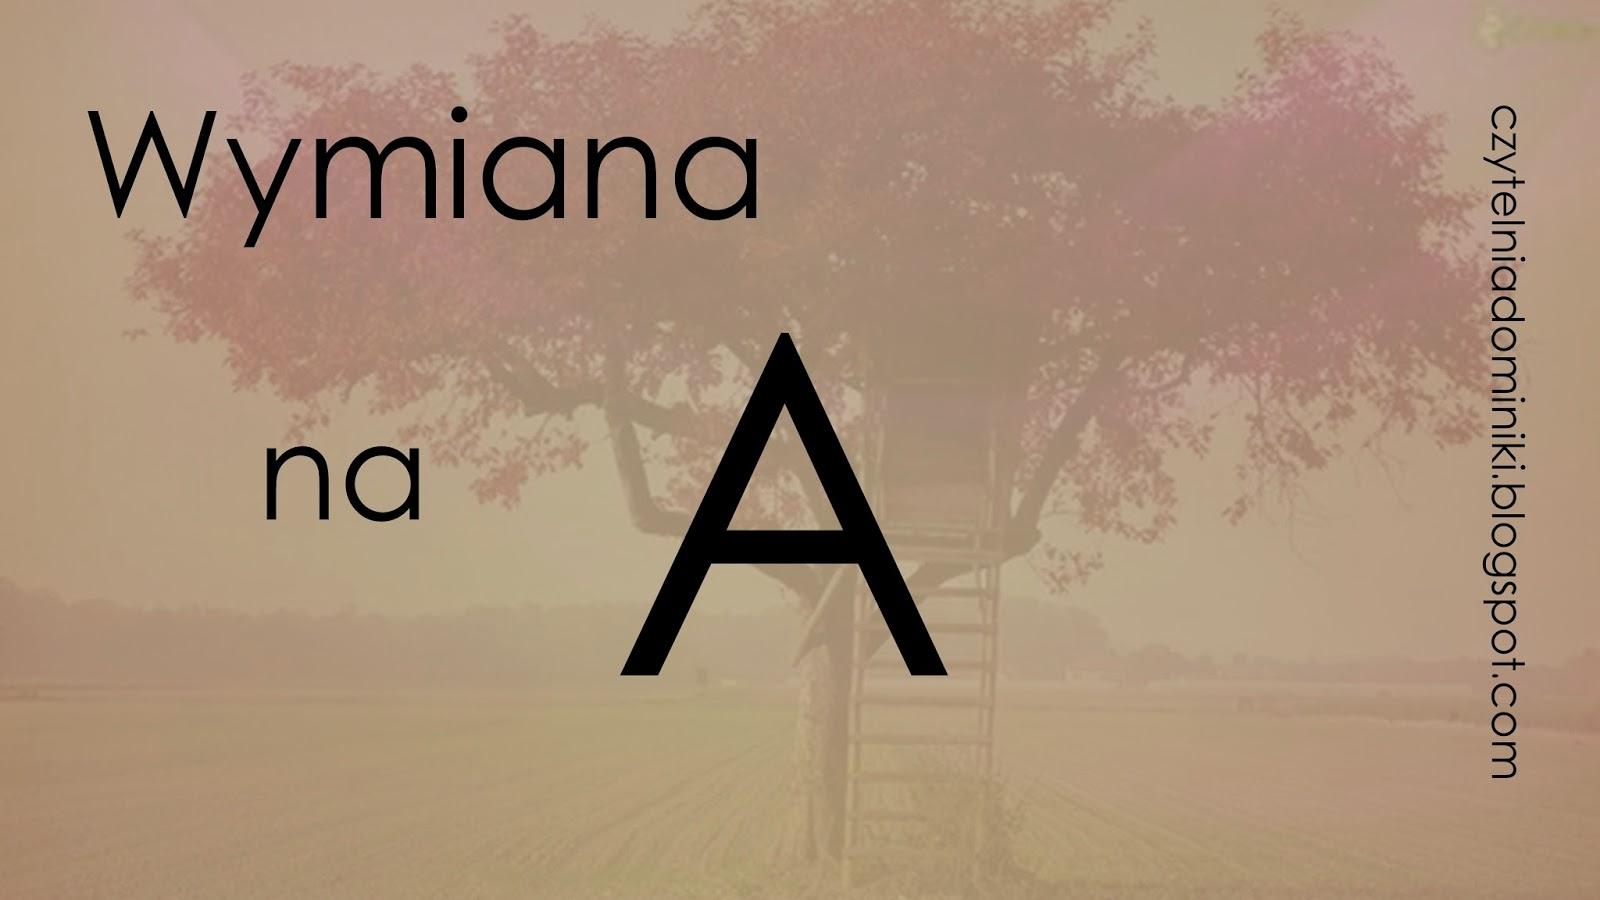 http://czytelniadominiki.blogspot.com/2014/08/wymiana-na-zapisy.html